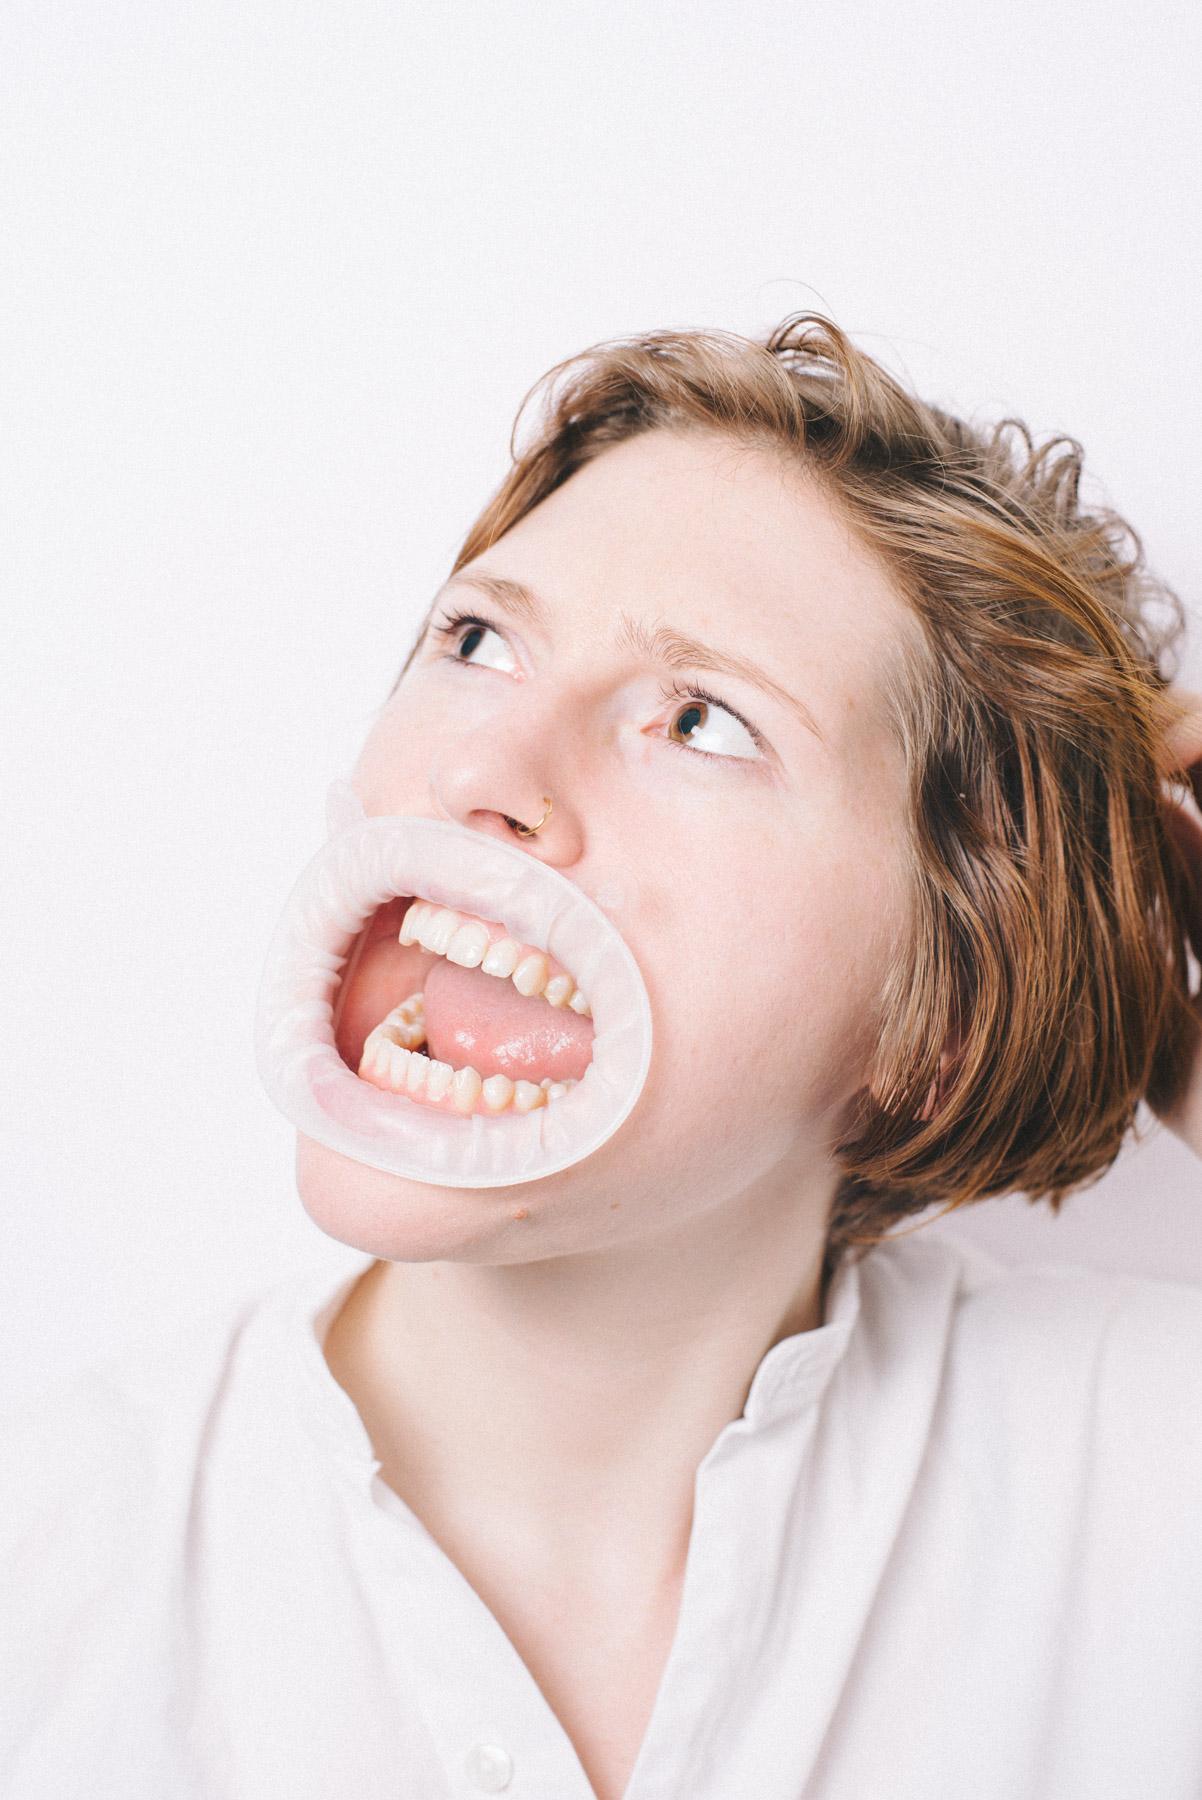 Zahnmedizin Werbung